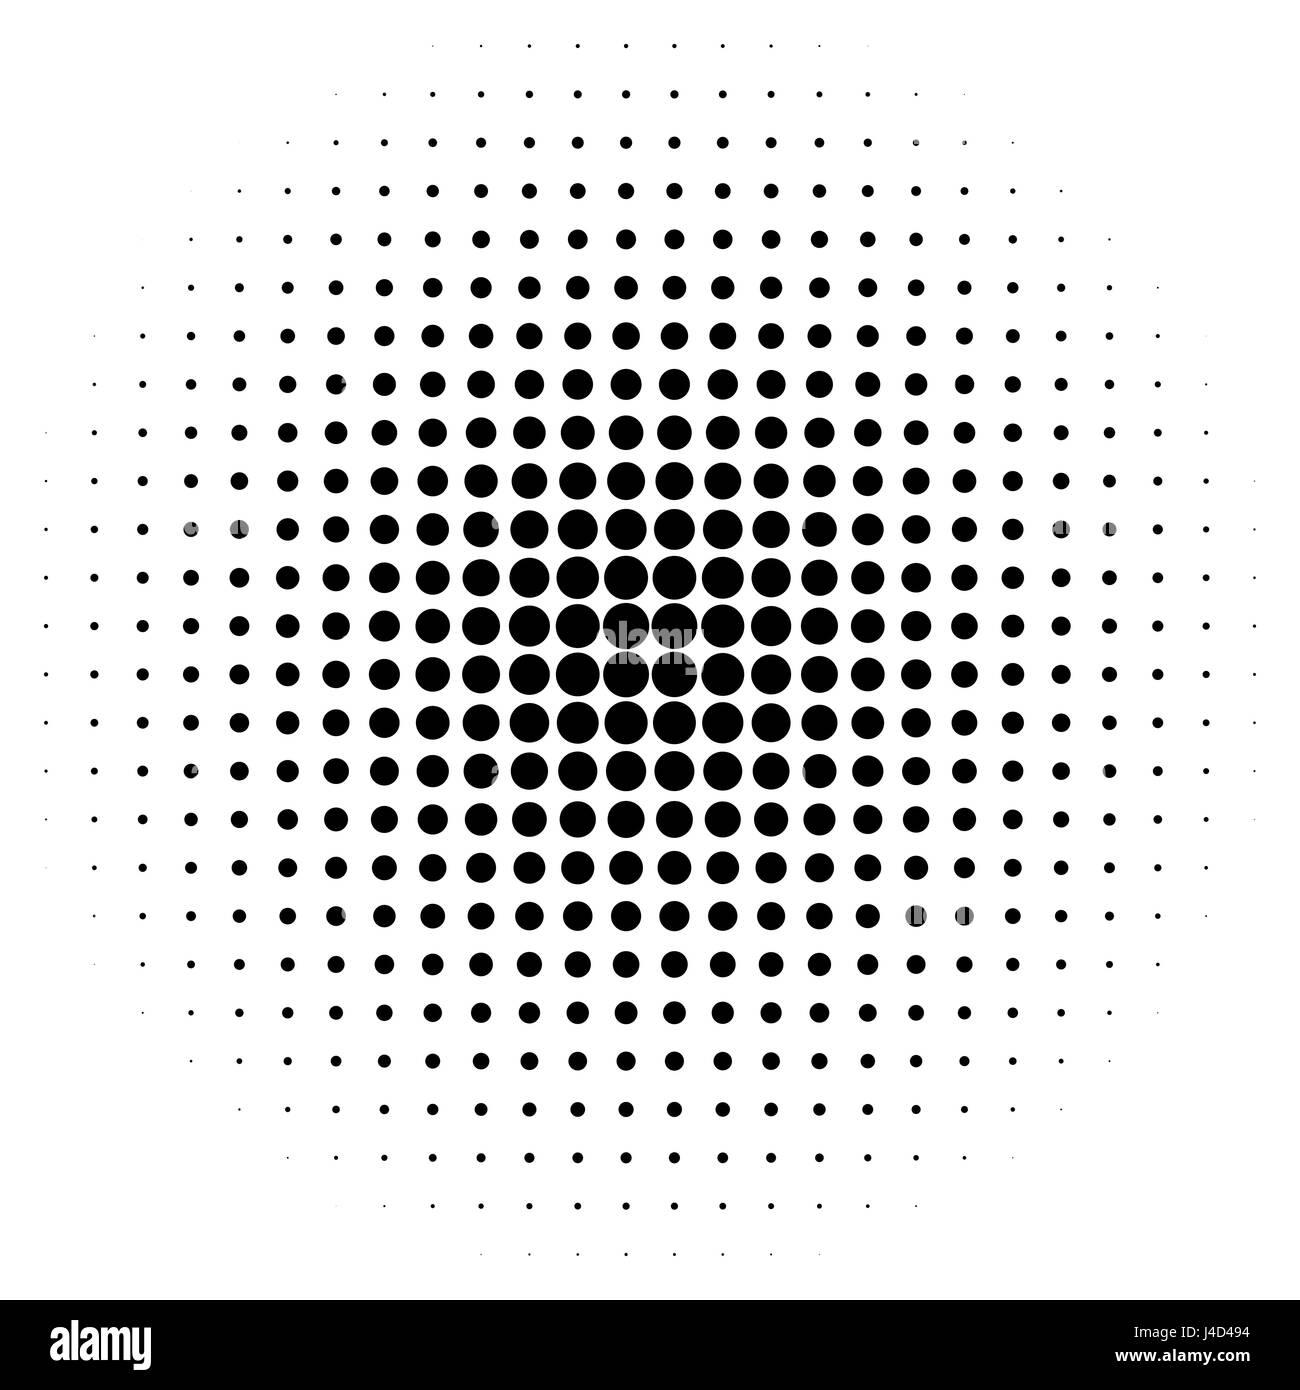 grunge halftone vector background vintage dots stock vector art rh alamy com halftone vector download halftone vector free